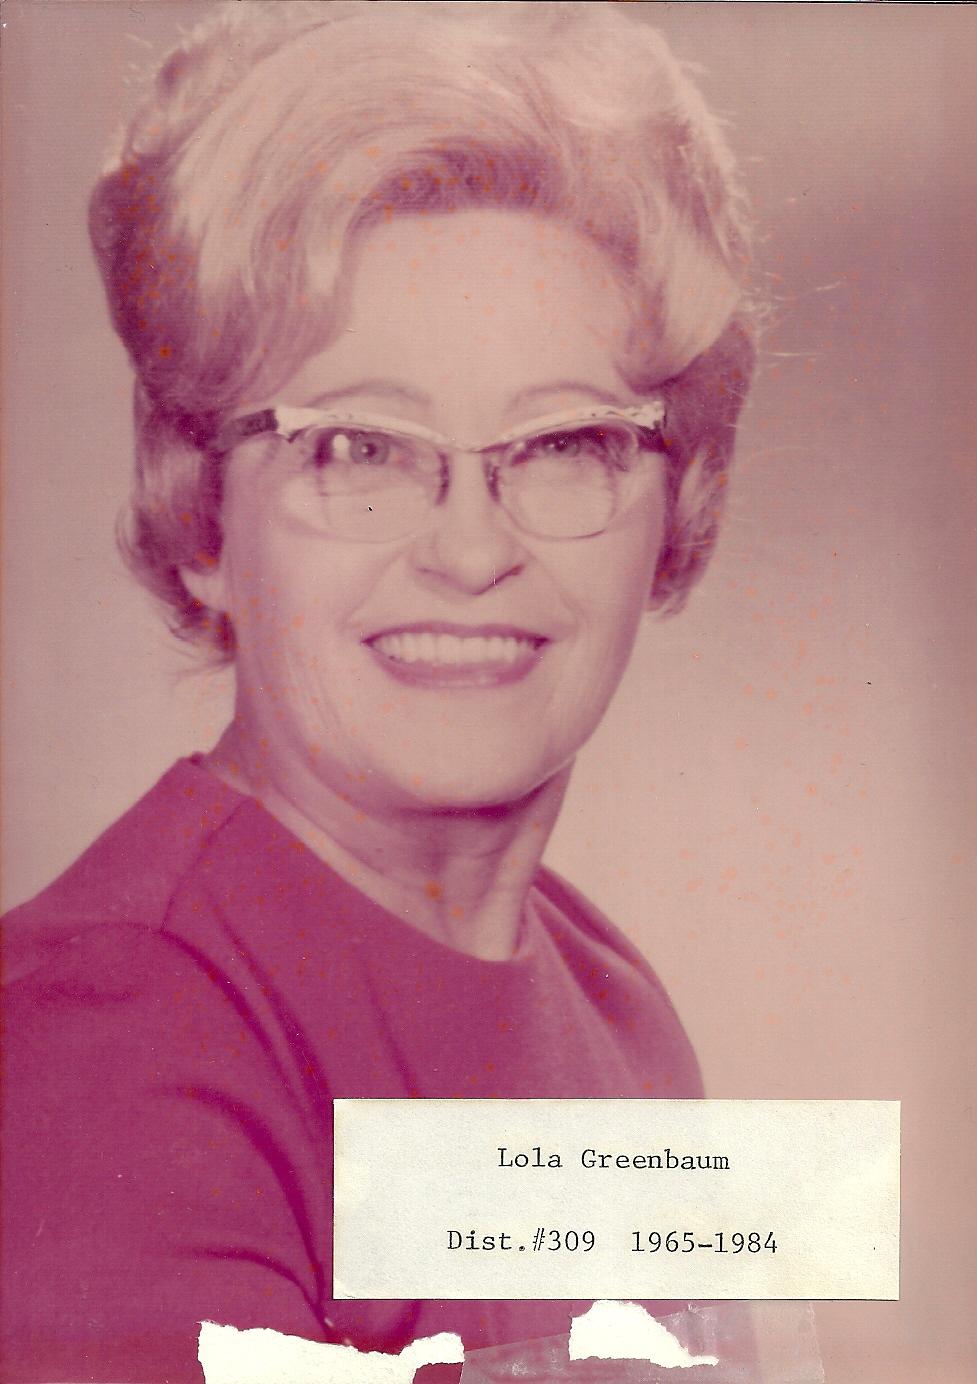 Lola Greenbaum